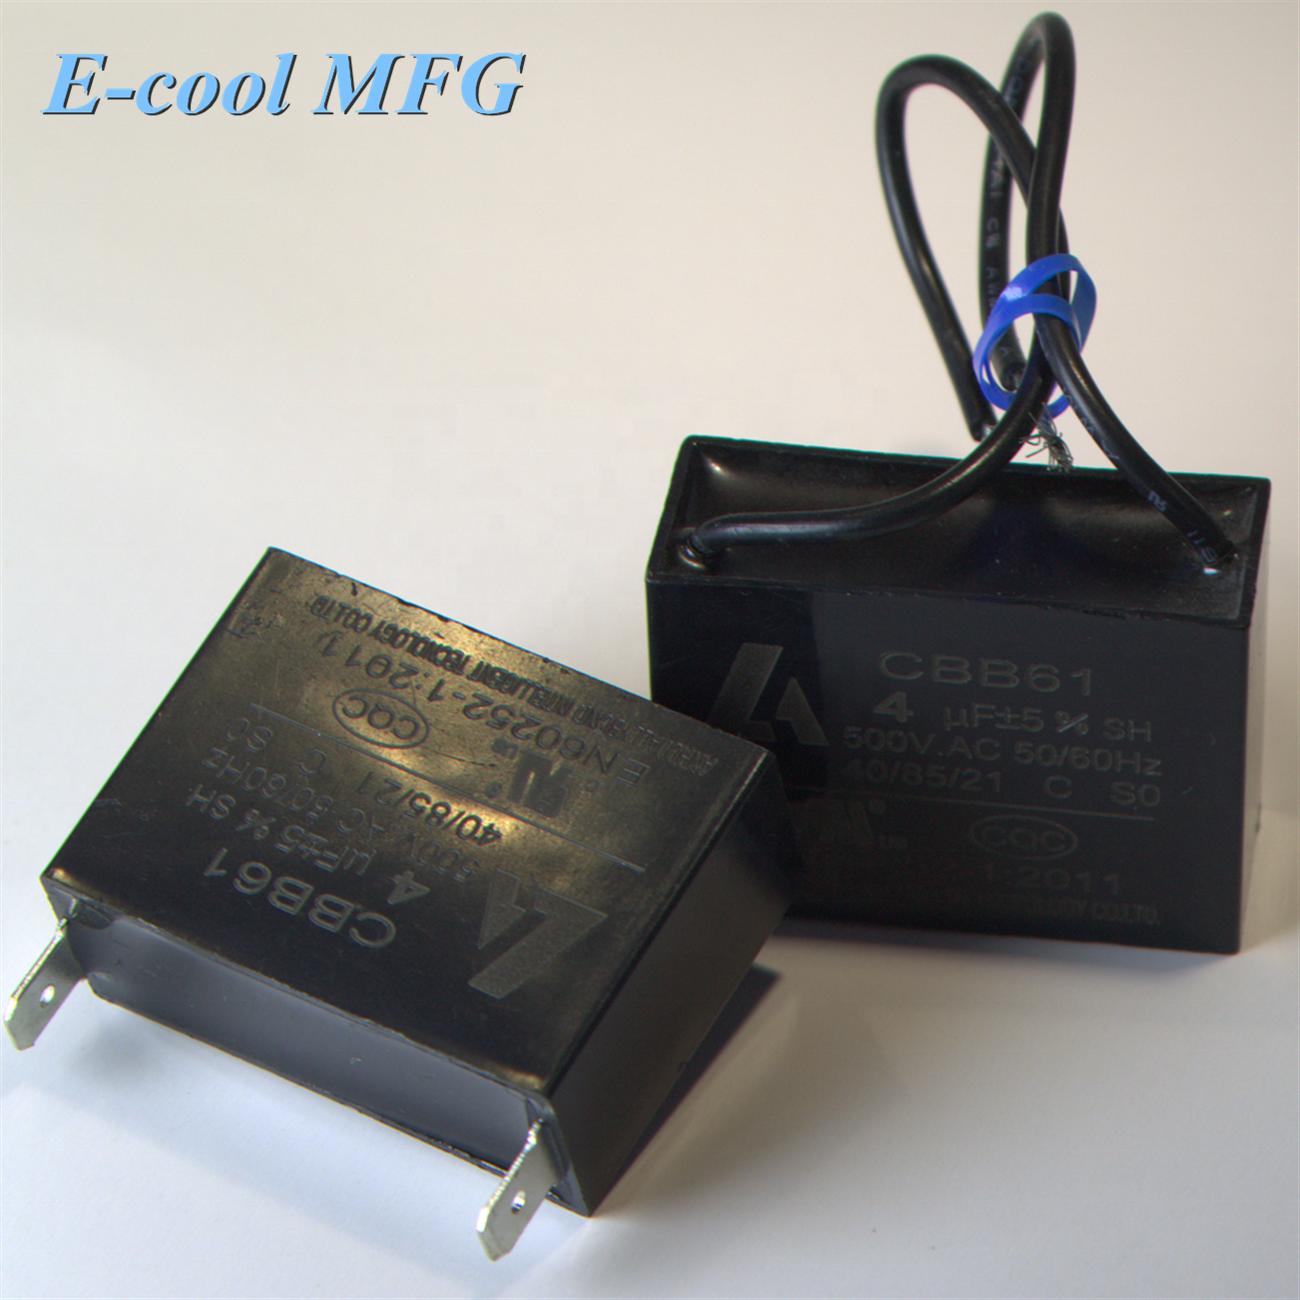 Cbb61 1.2uf 450 vac capacitor motor start